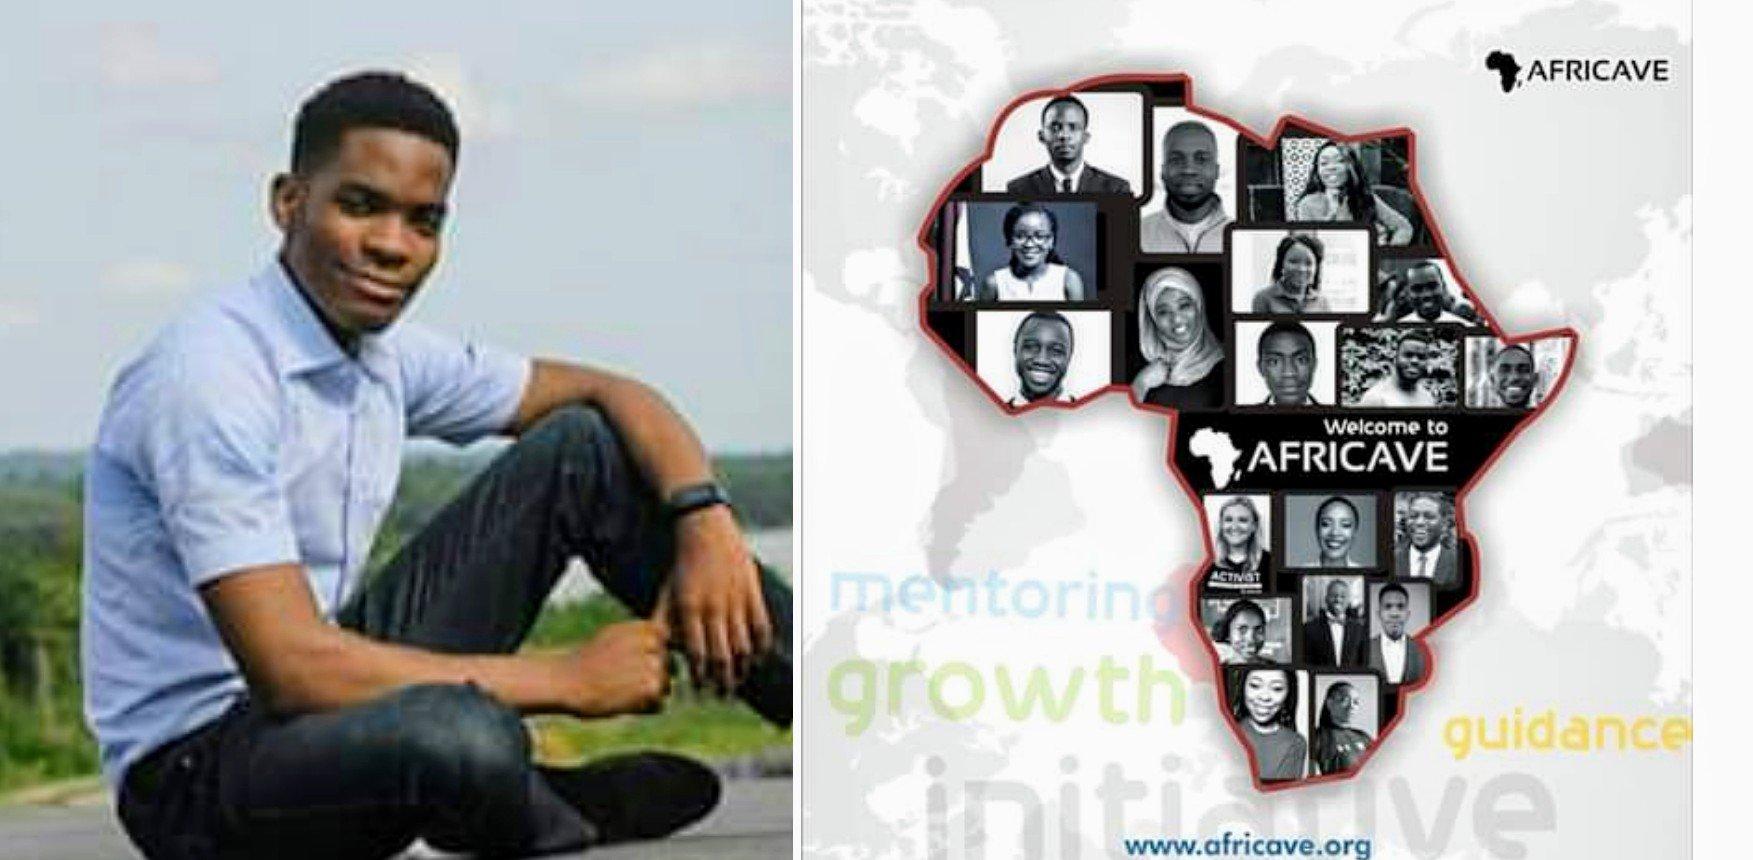 Ken Ekezie Launches AFRICAVE Initiative, Invites Applications